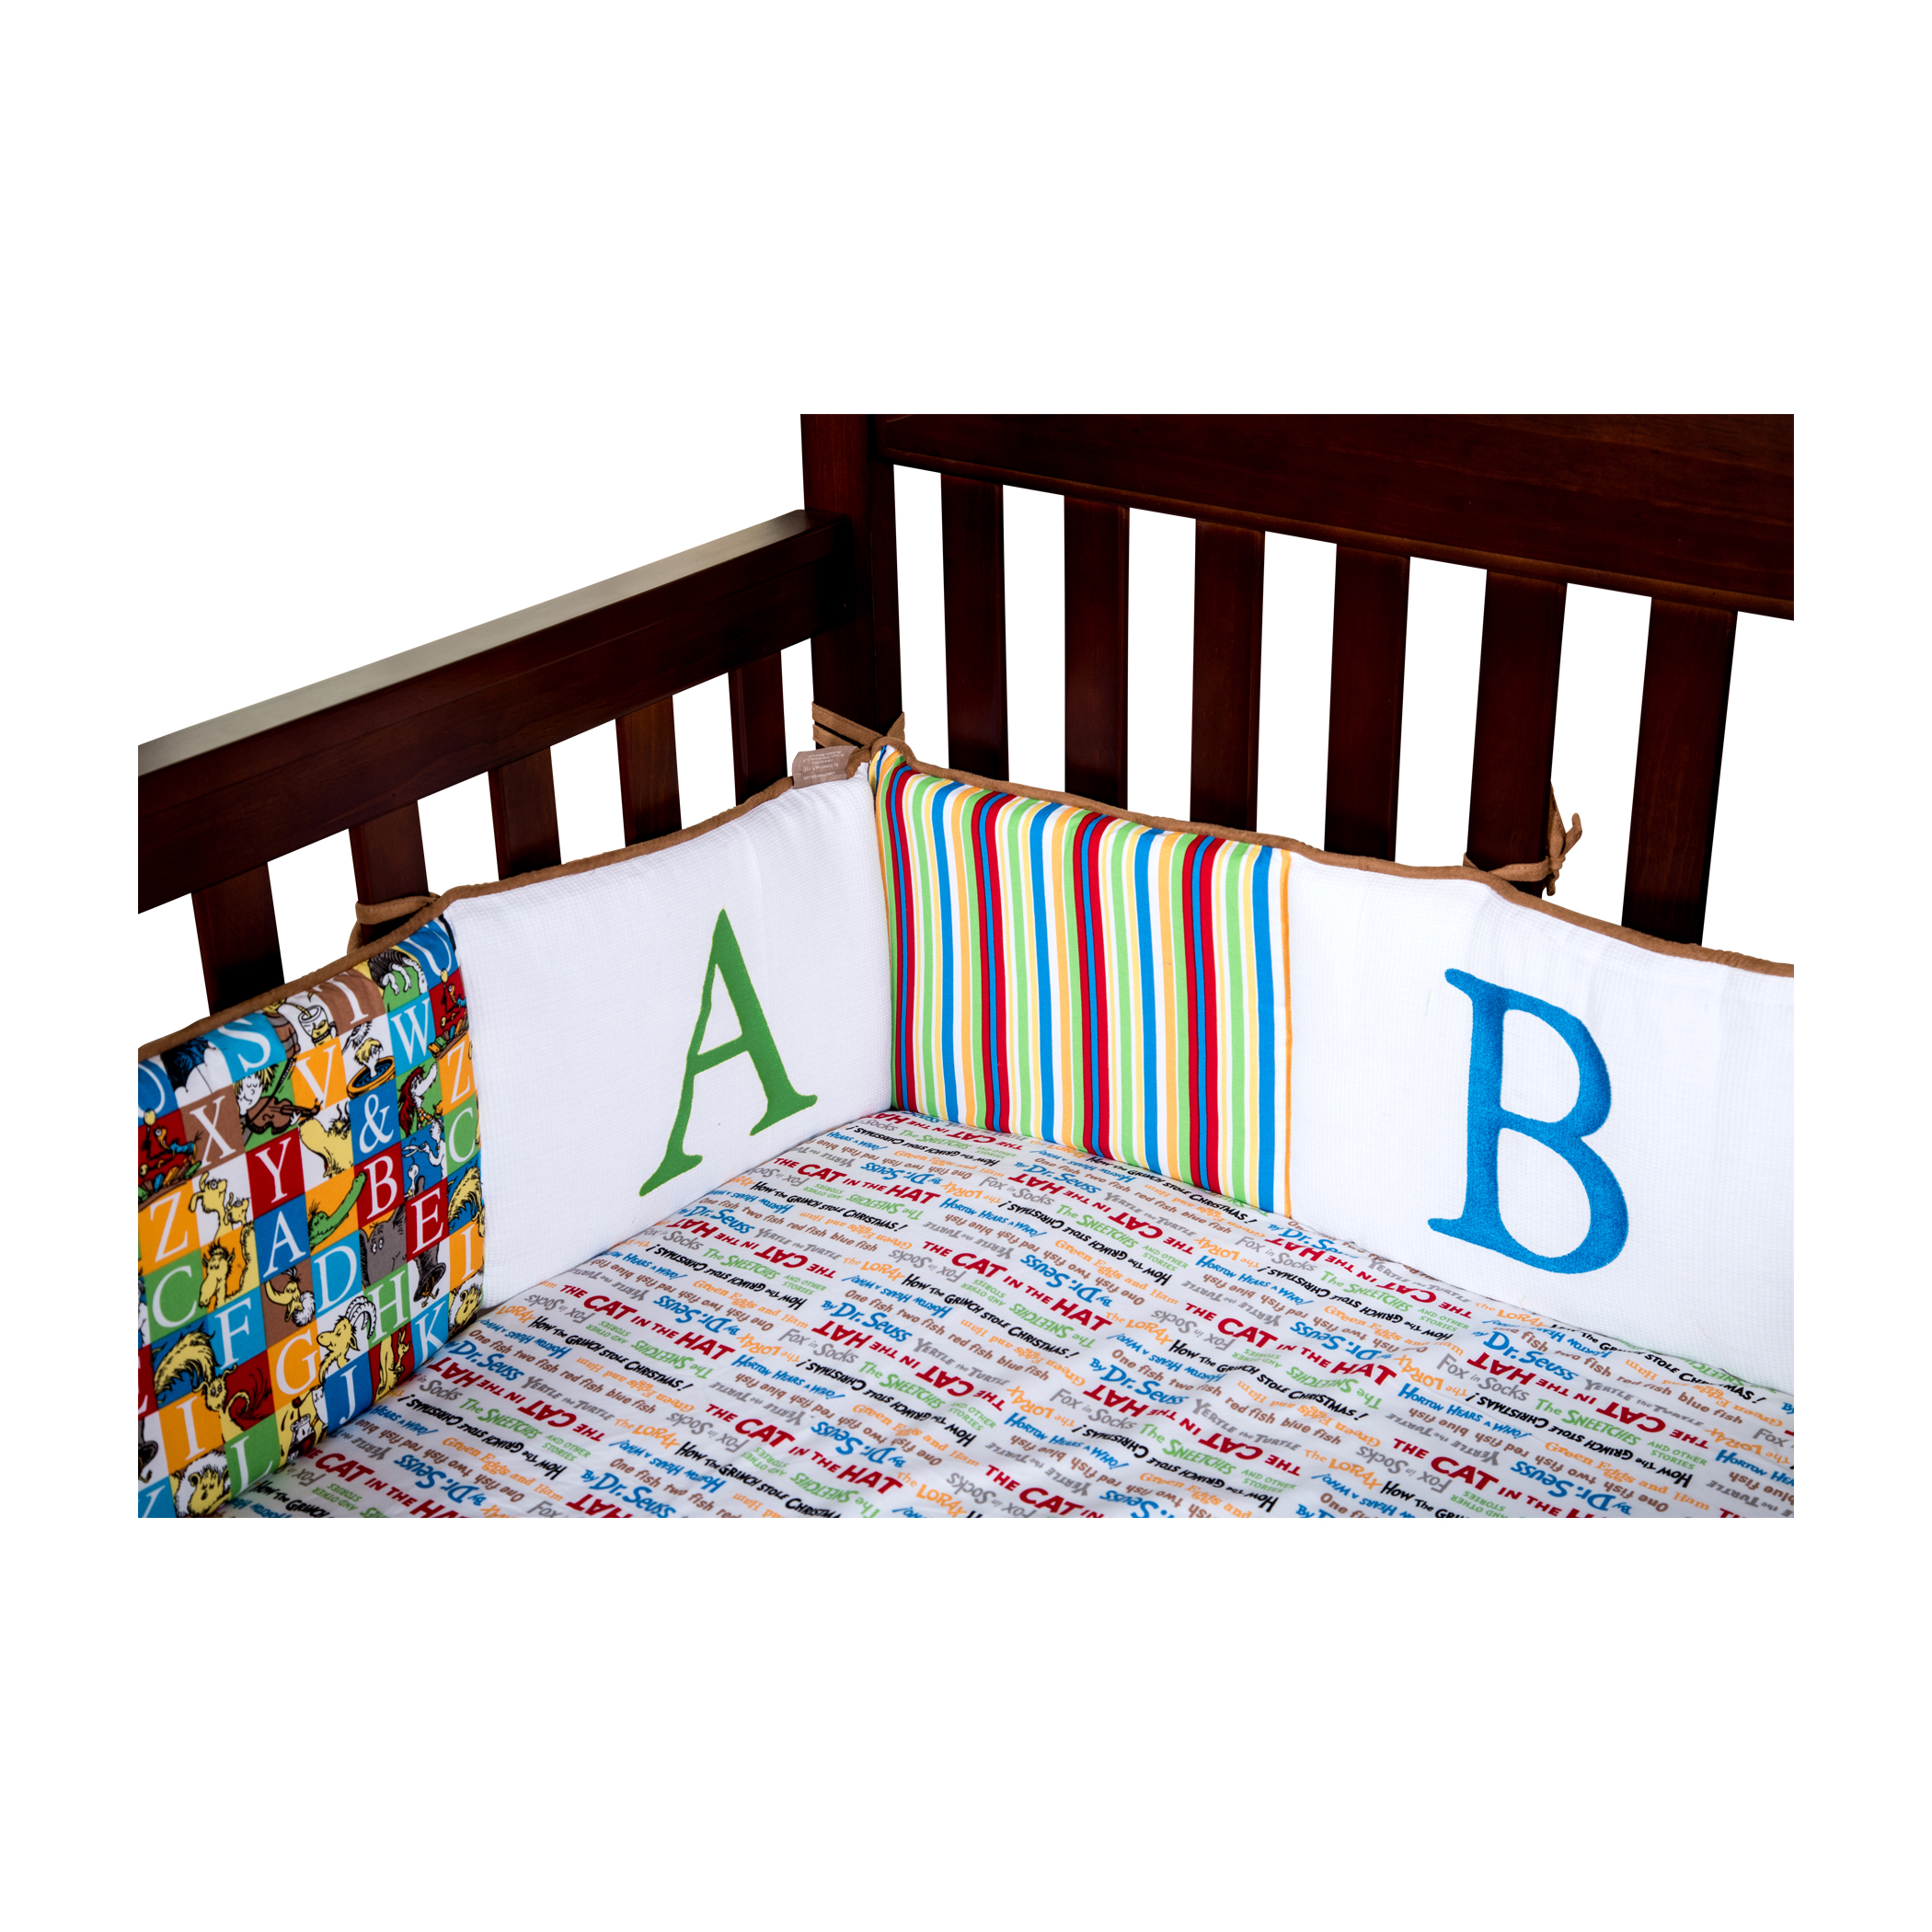 Dr. Seuss Alphabet Seuss Crib Bumper PartNumber: 04928056000P